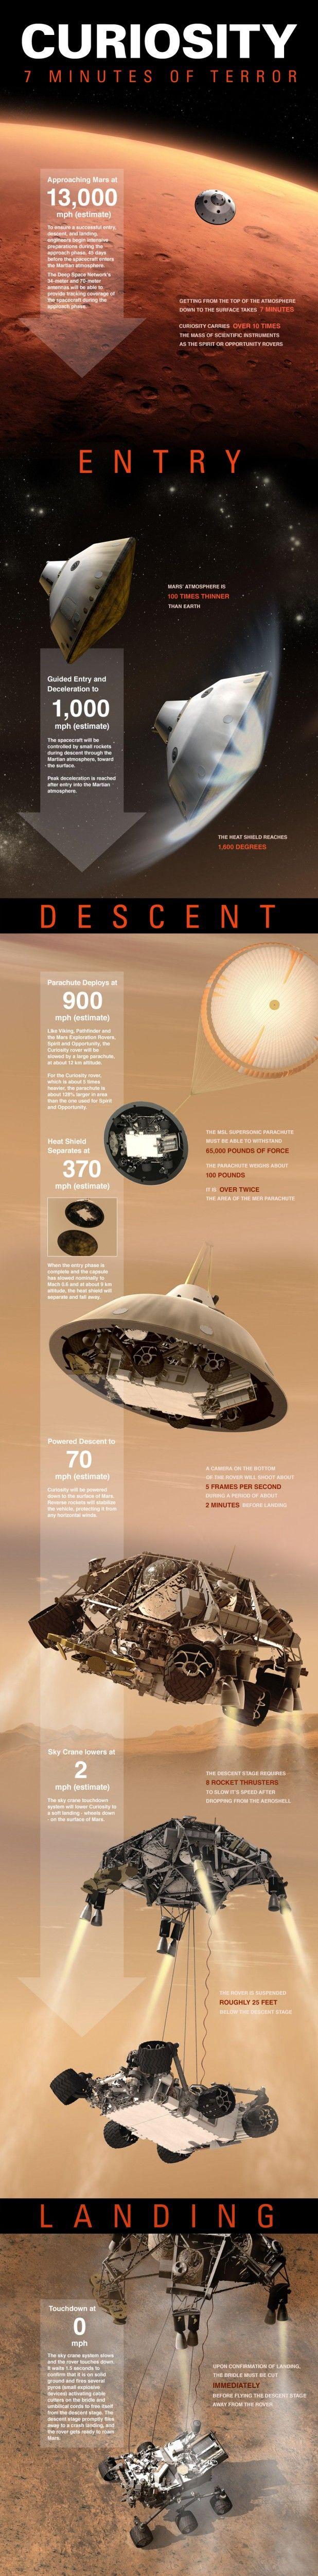 Very informative infograghic on Curiosity's landing on Mars